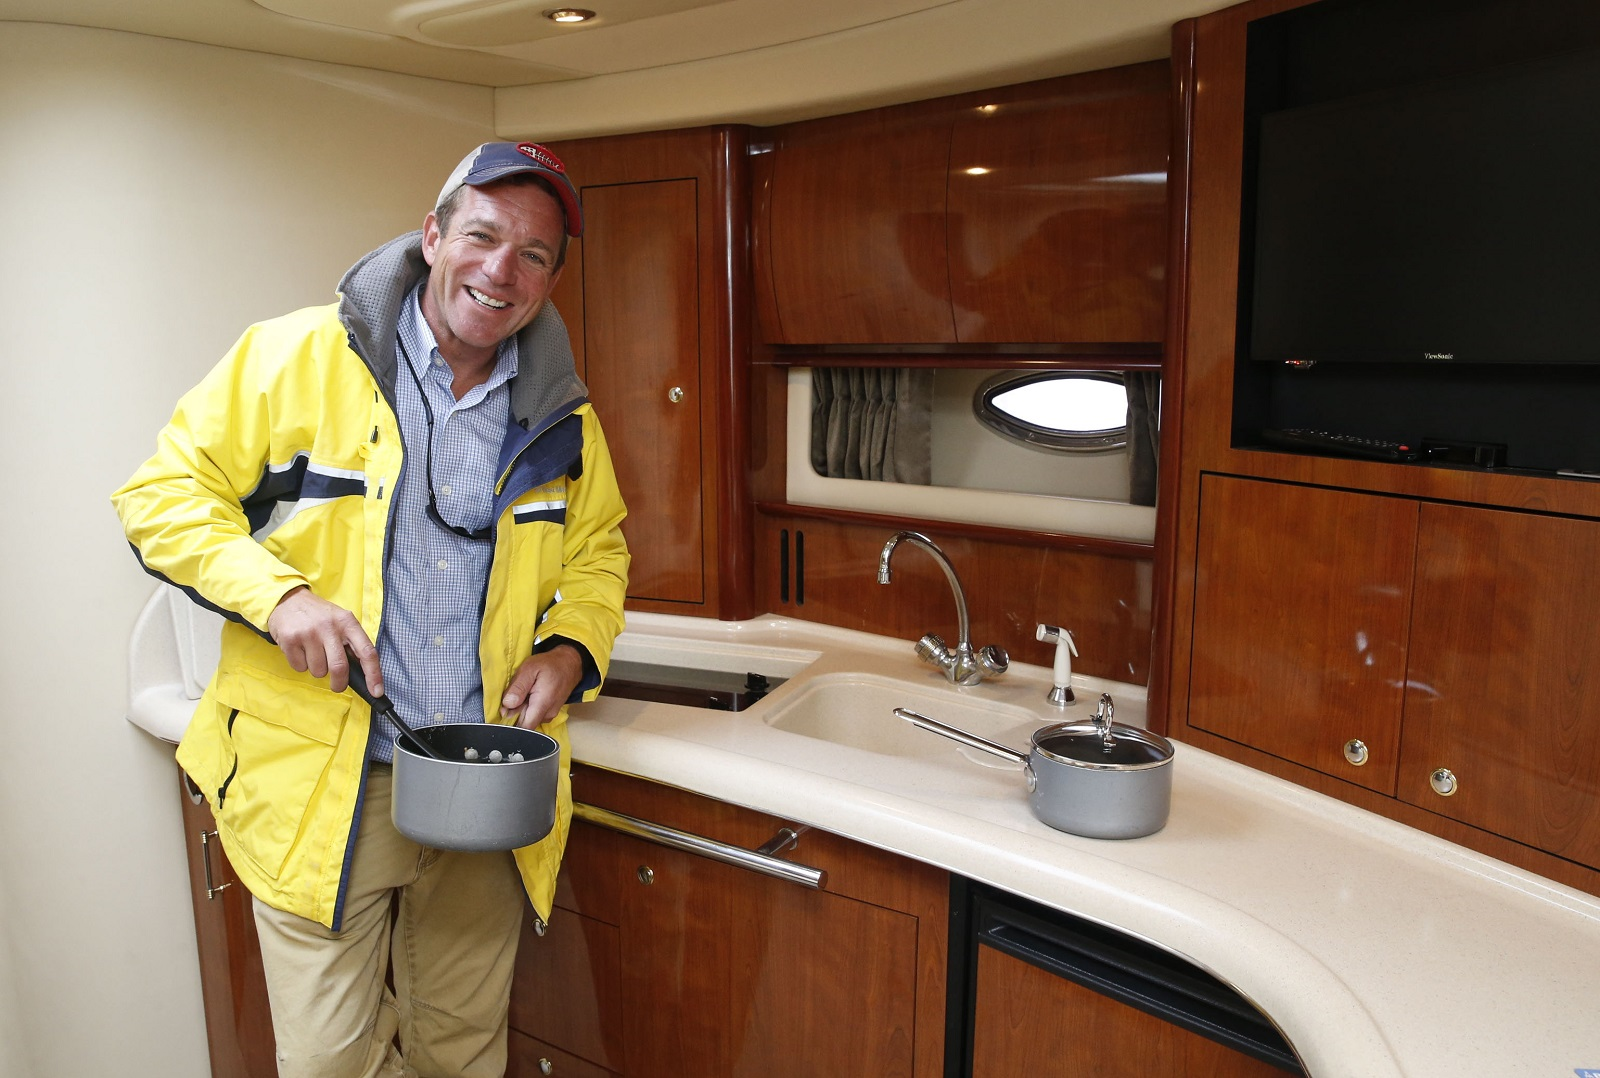 Curtin hangs out in the yacht's kitchen. (Robert Kirkham/Buffalo News)